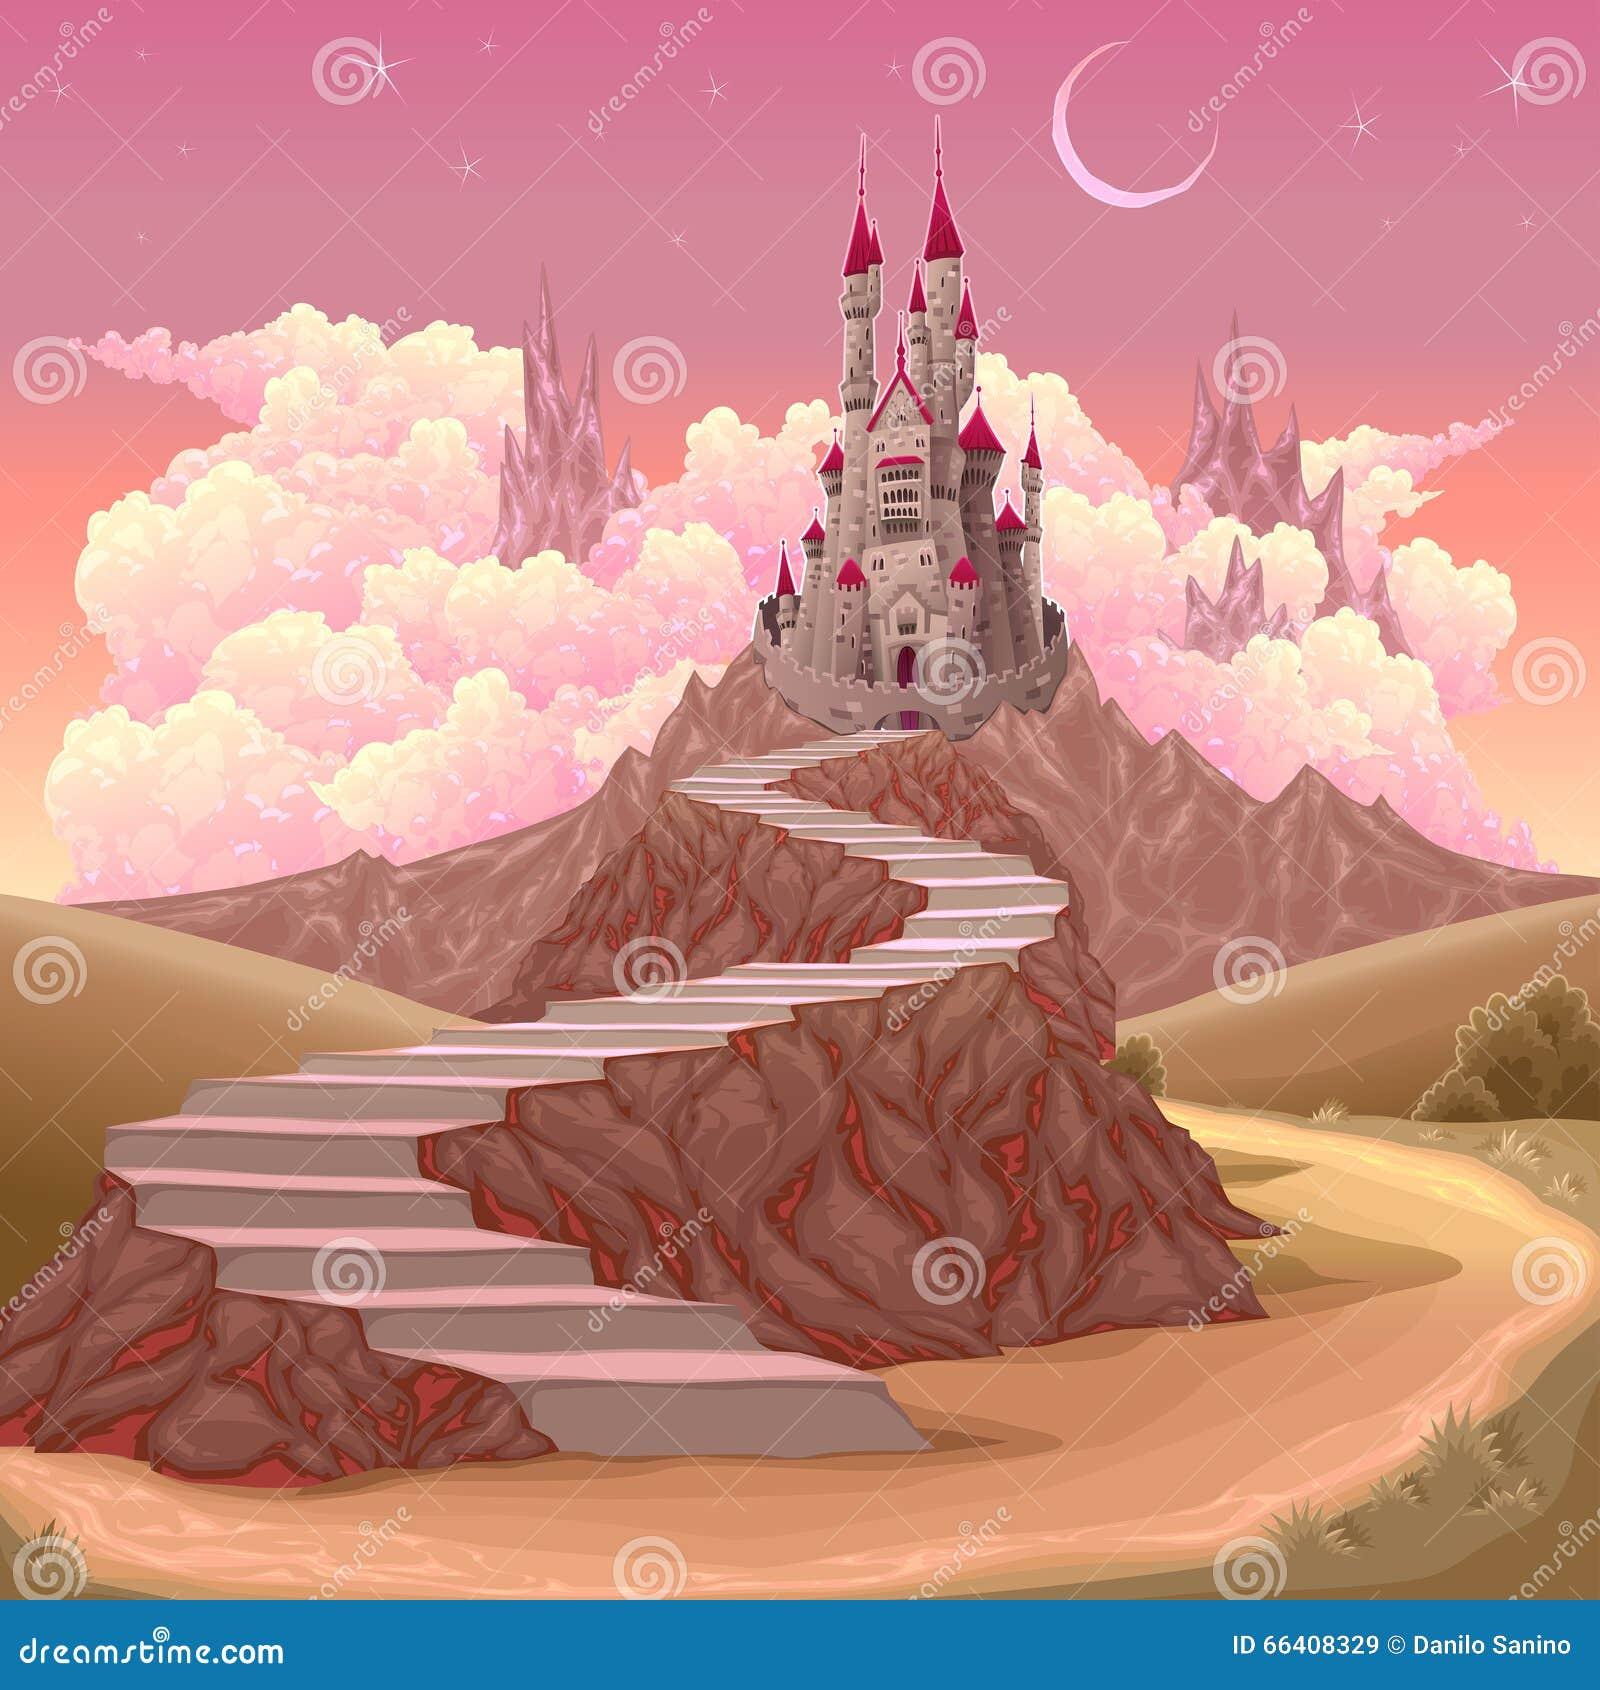 fantasy landscape with castle stock vector